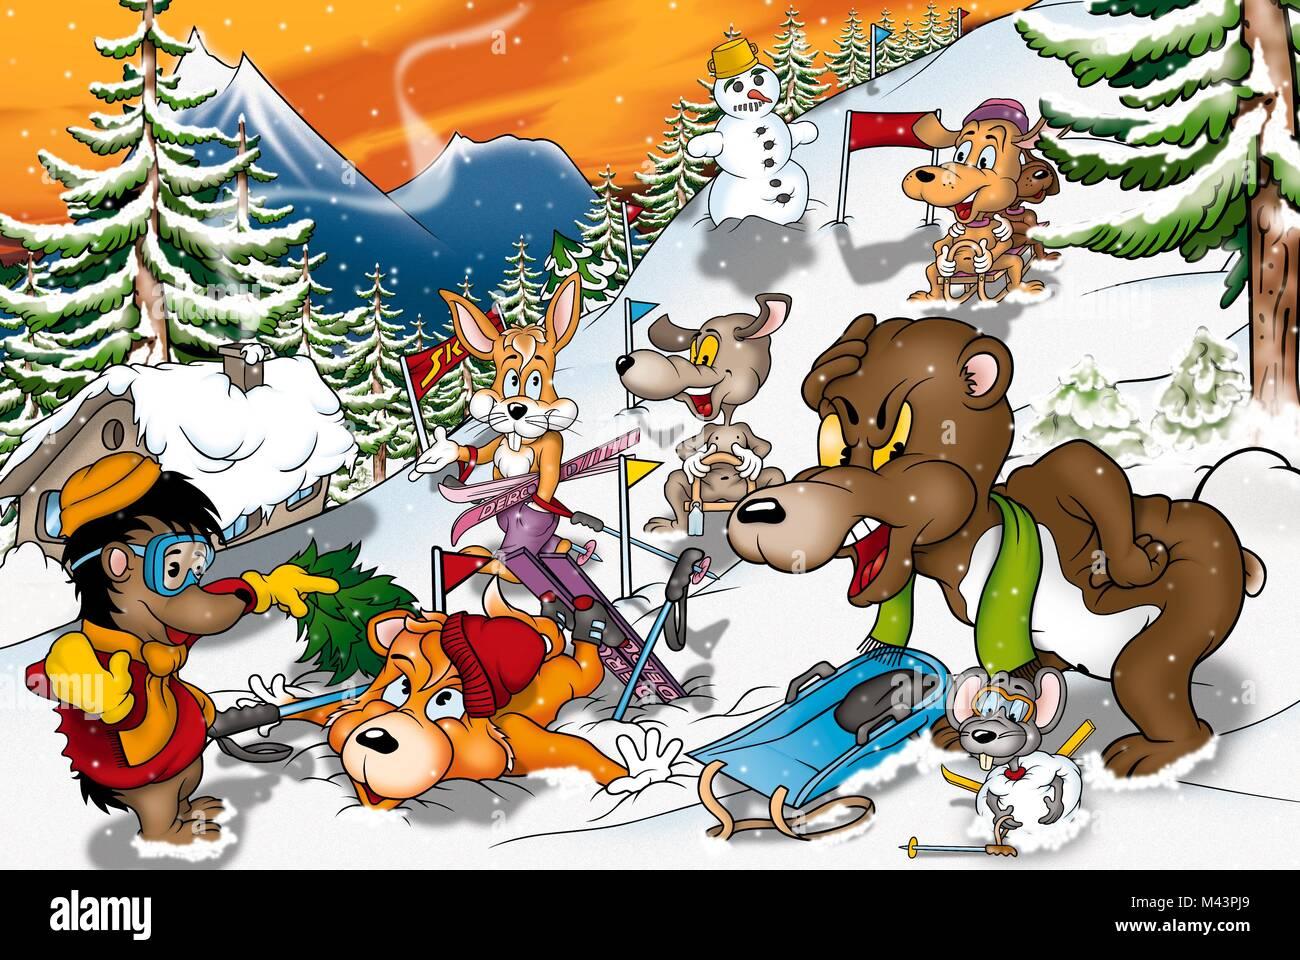 Animals in Winter - Stock Image